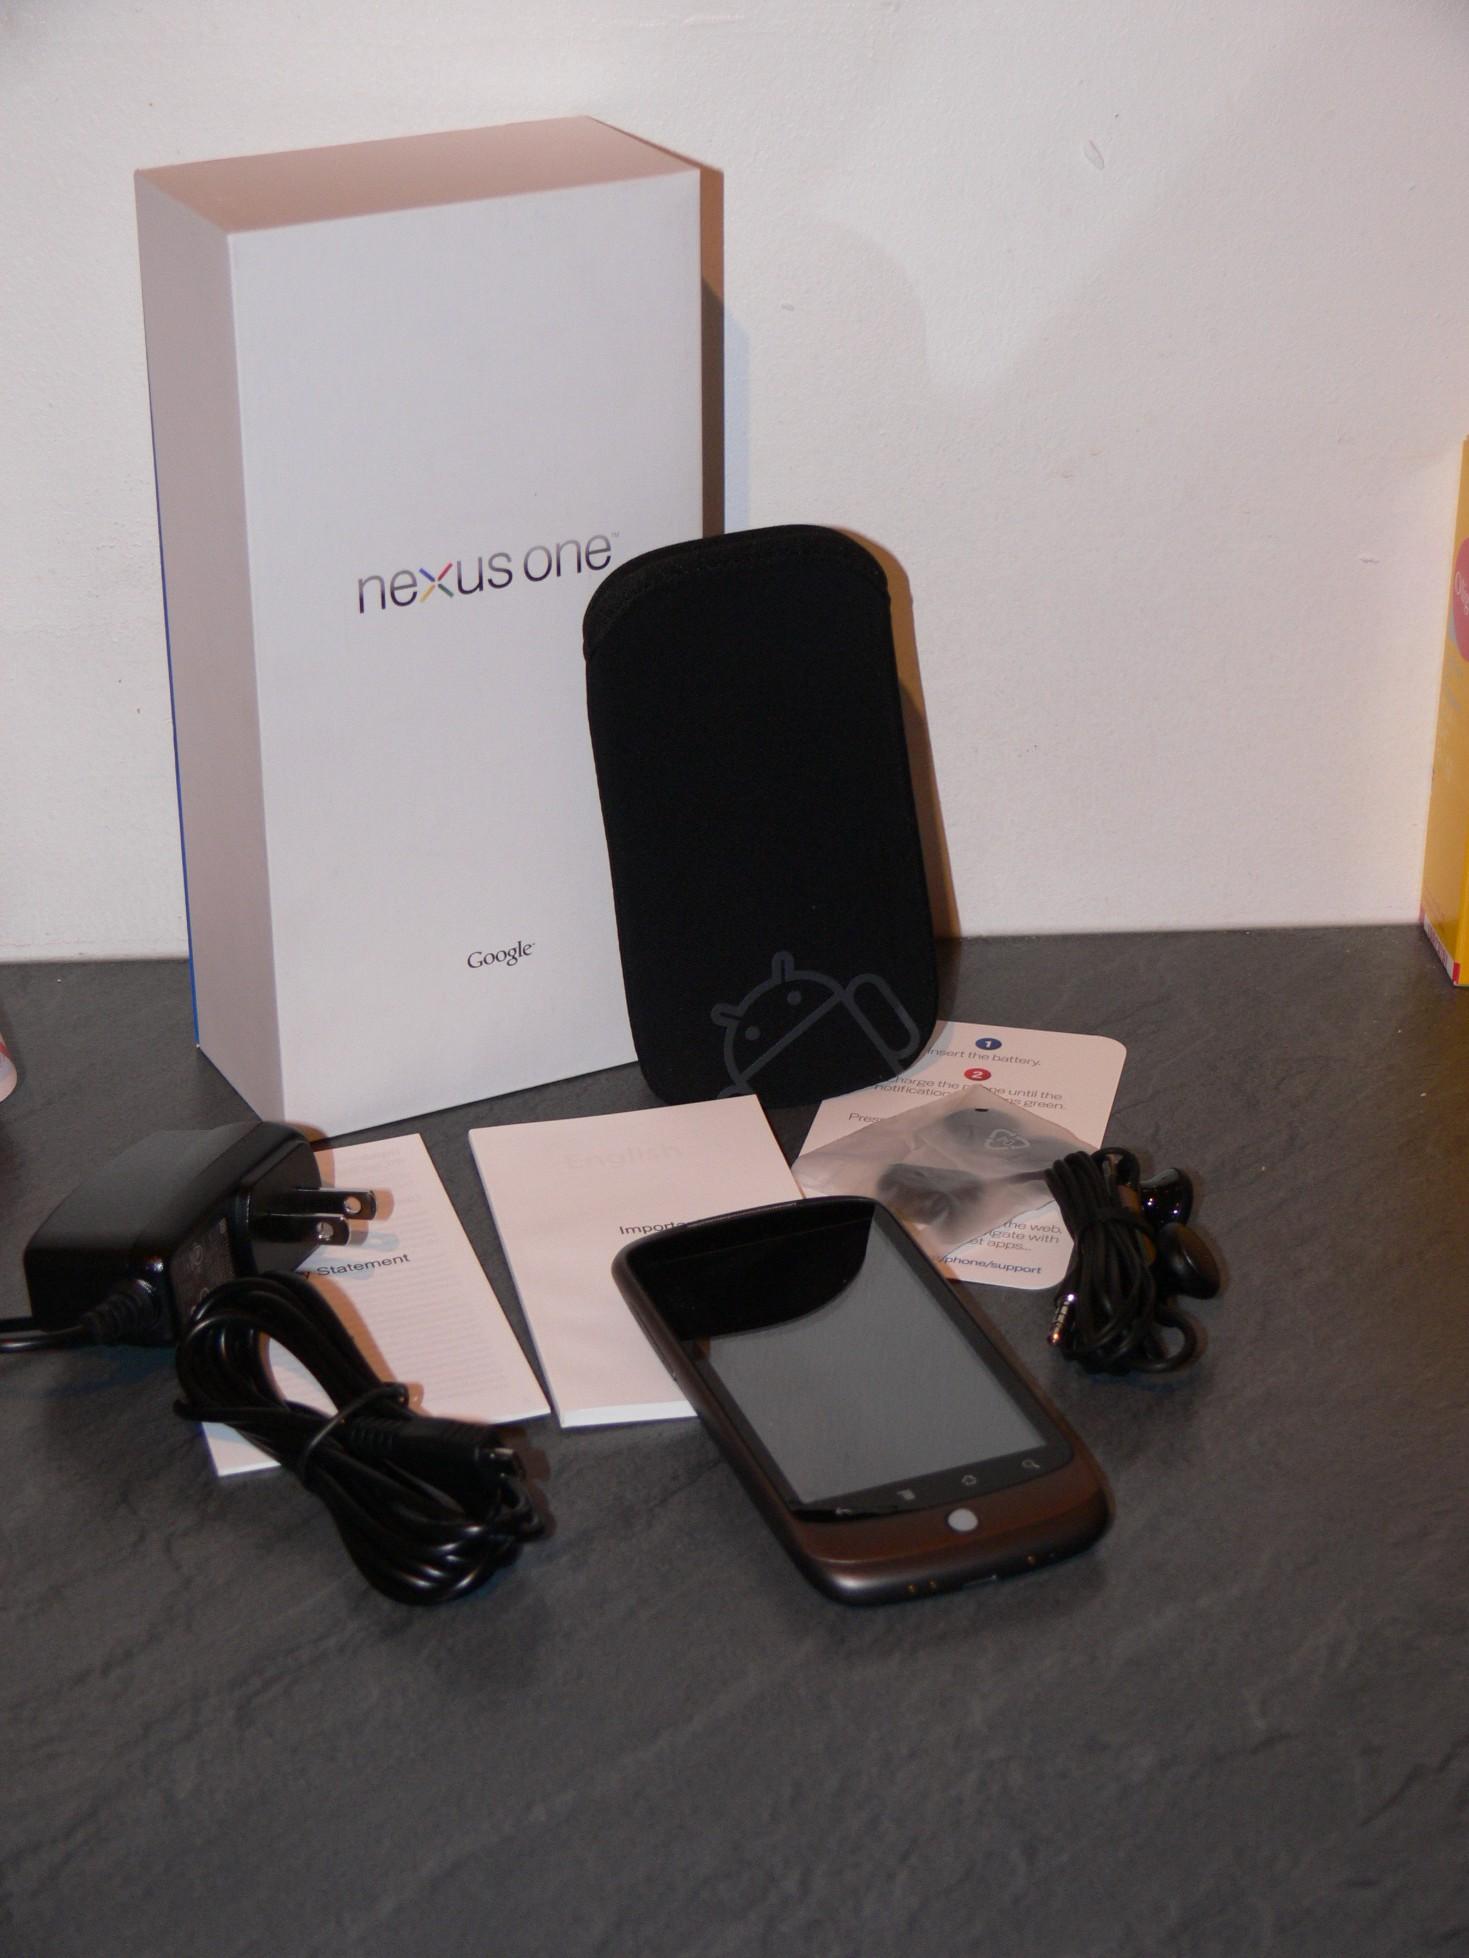 [Exclu] Test du Google Nexus One par Frandroid